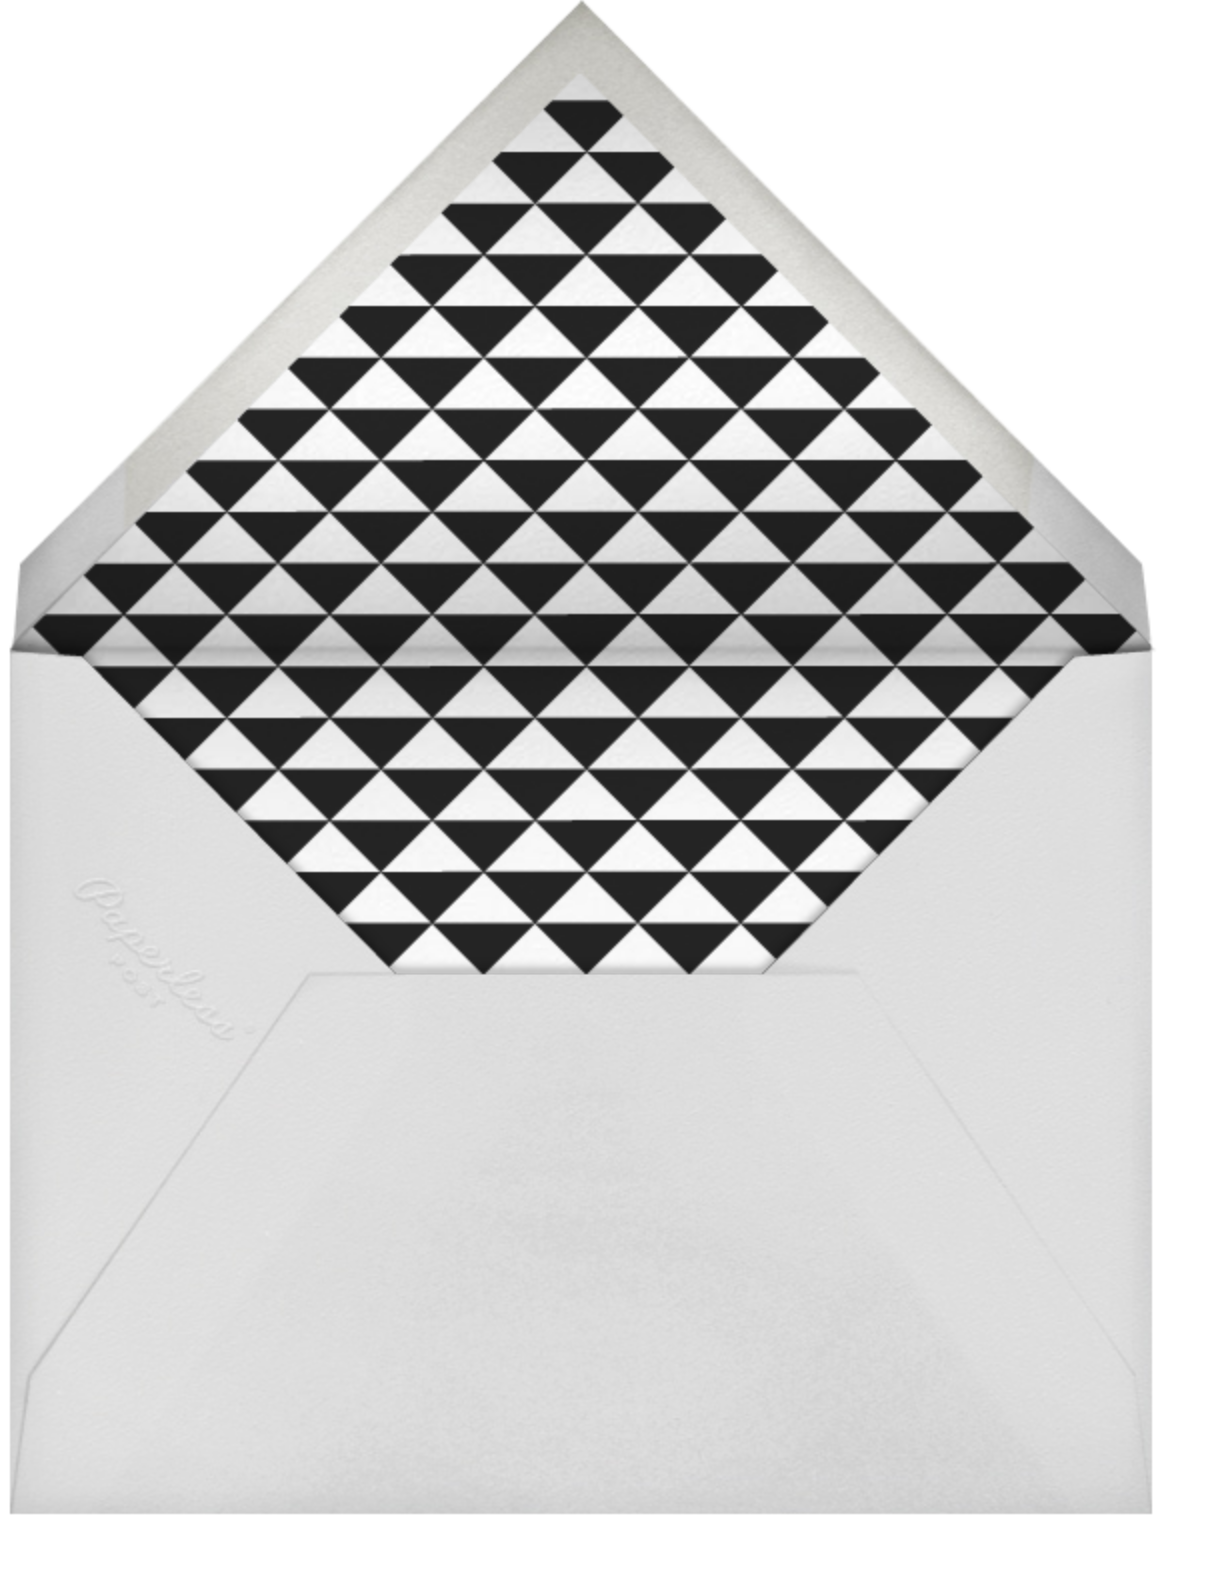 Jolly Good Photo (Him) - Paperless Post - Milestone  - envelope back